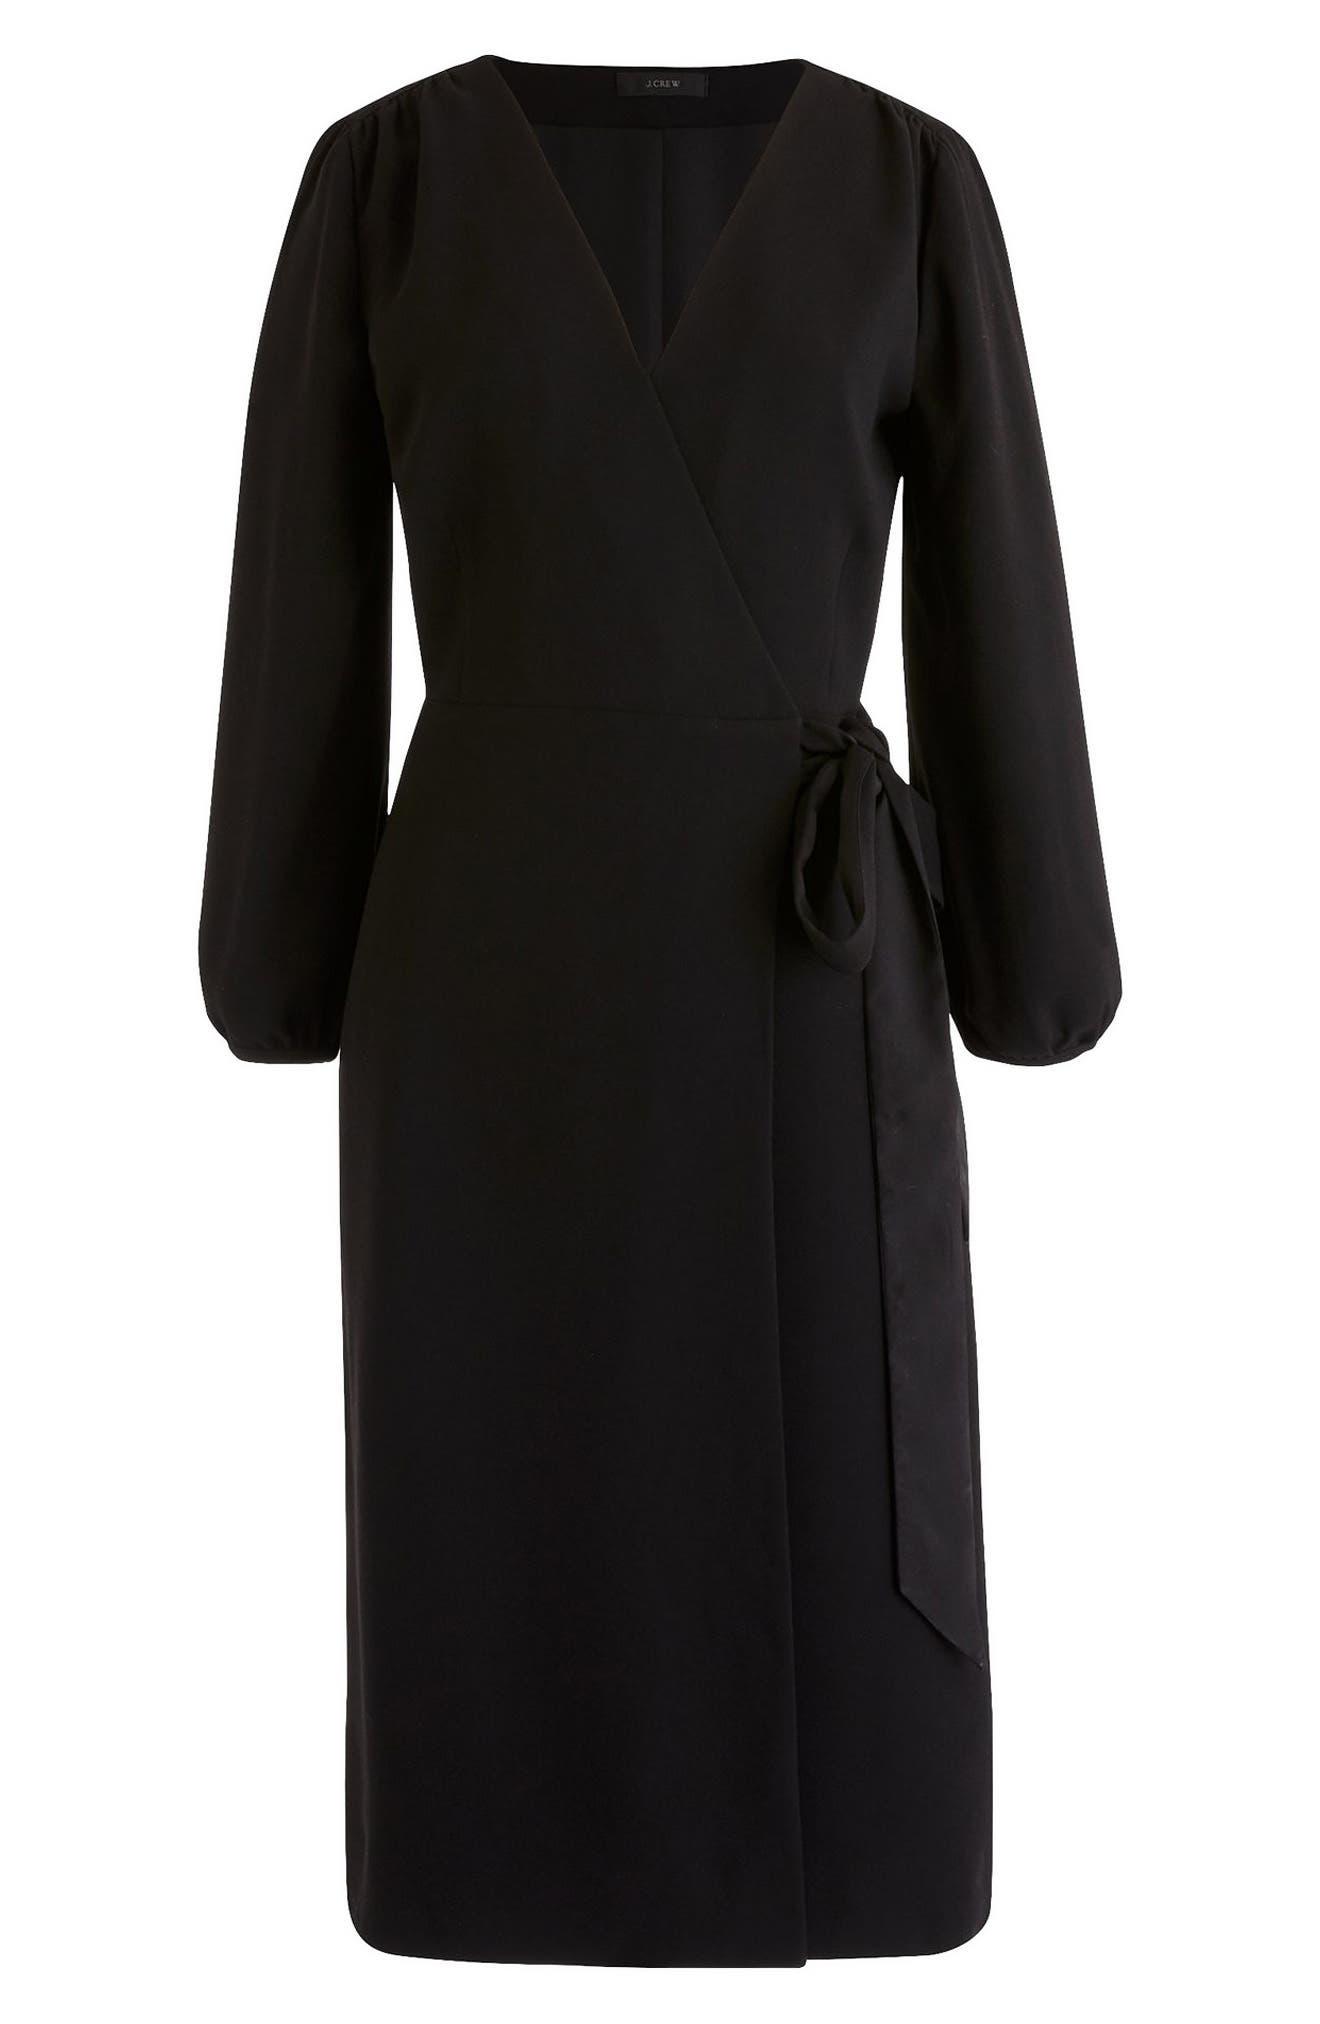 J.CREW,                             365 Crepe Wrap Dress,                             Alternate thumbnail 2, color,                             001